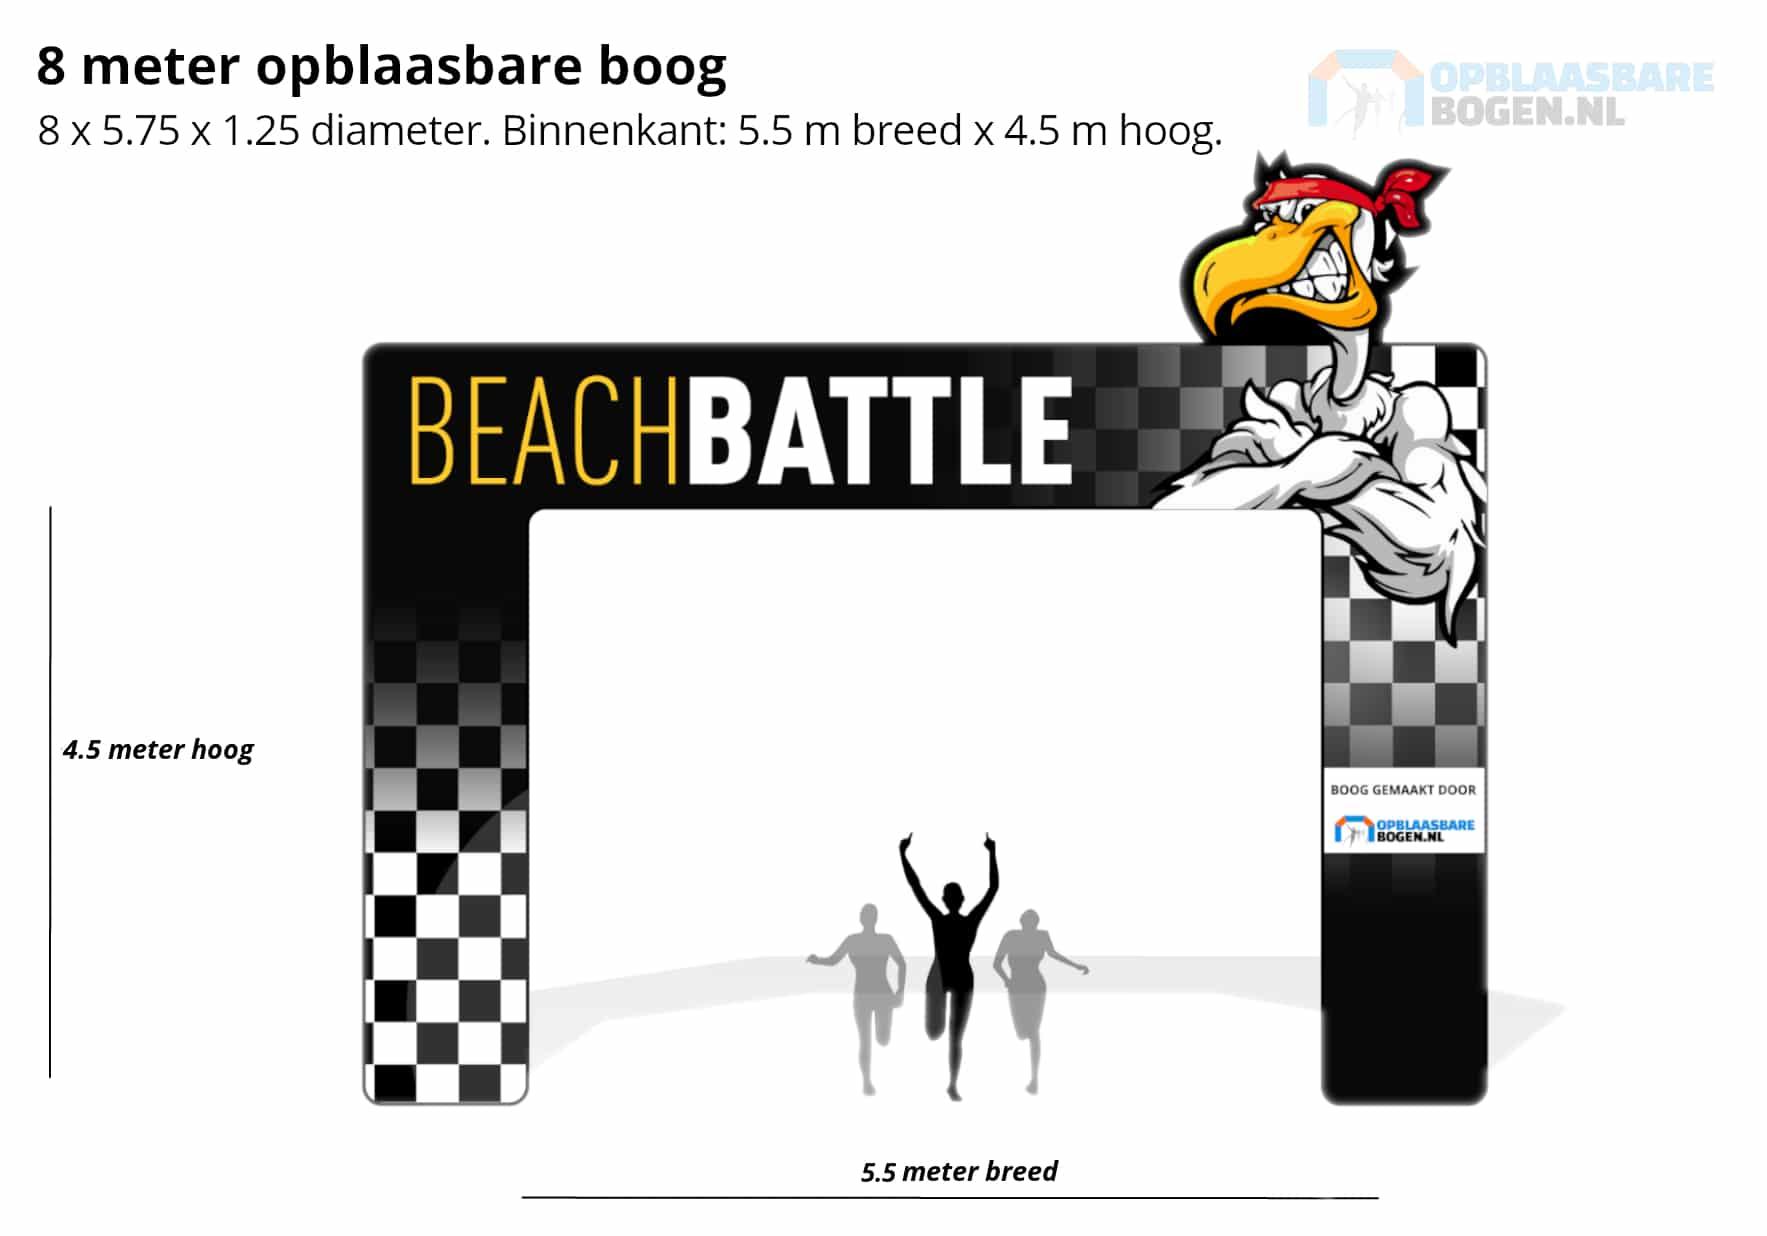 Opblaasbare boog Beach Battle met 3D element Opblaasbarebogen